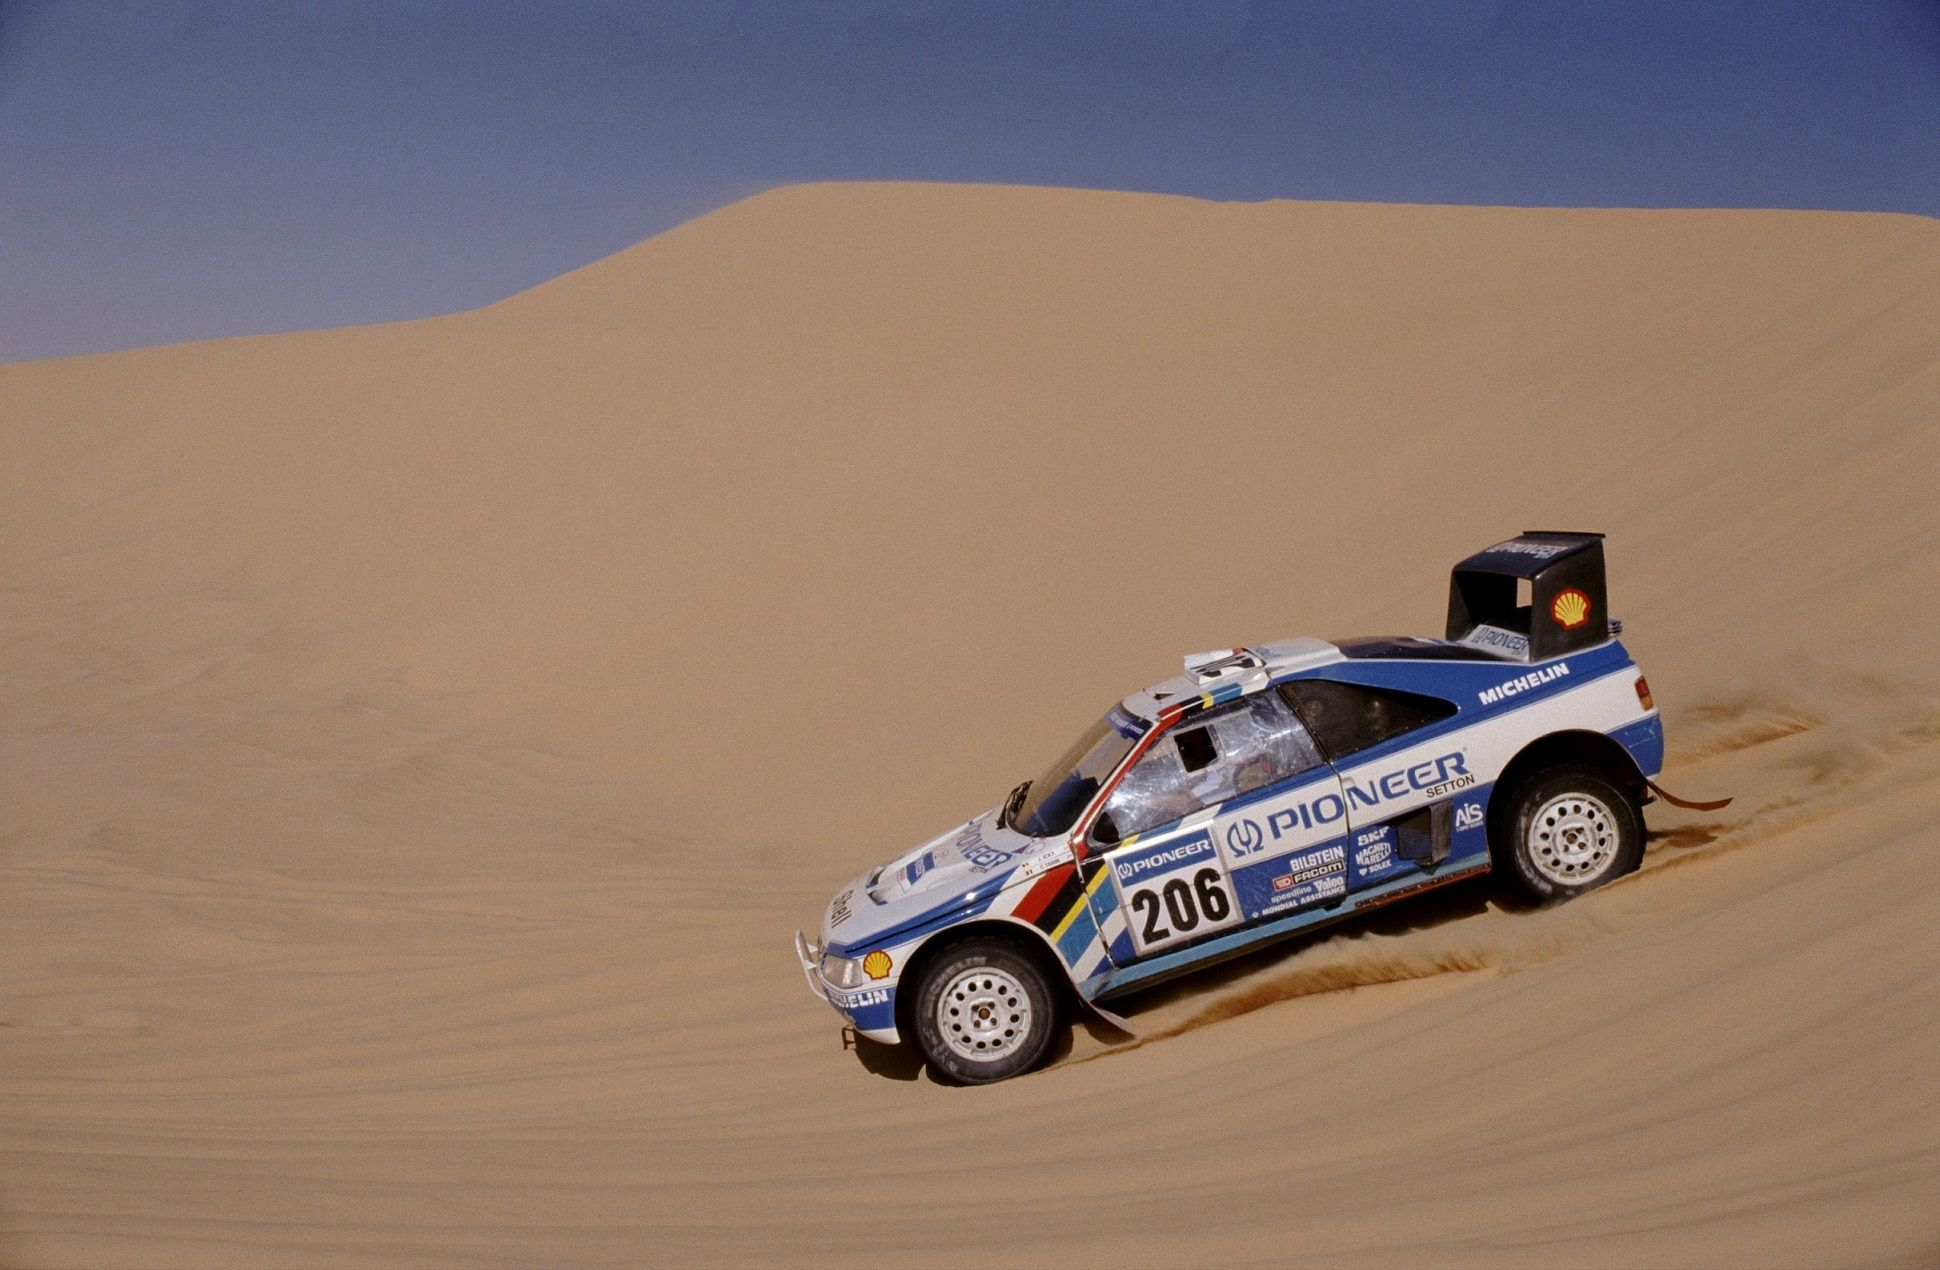 Peugeot 405 Turbo 16 Grand Raid (Icks / Tarin) - Dakar Rally 1989.